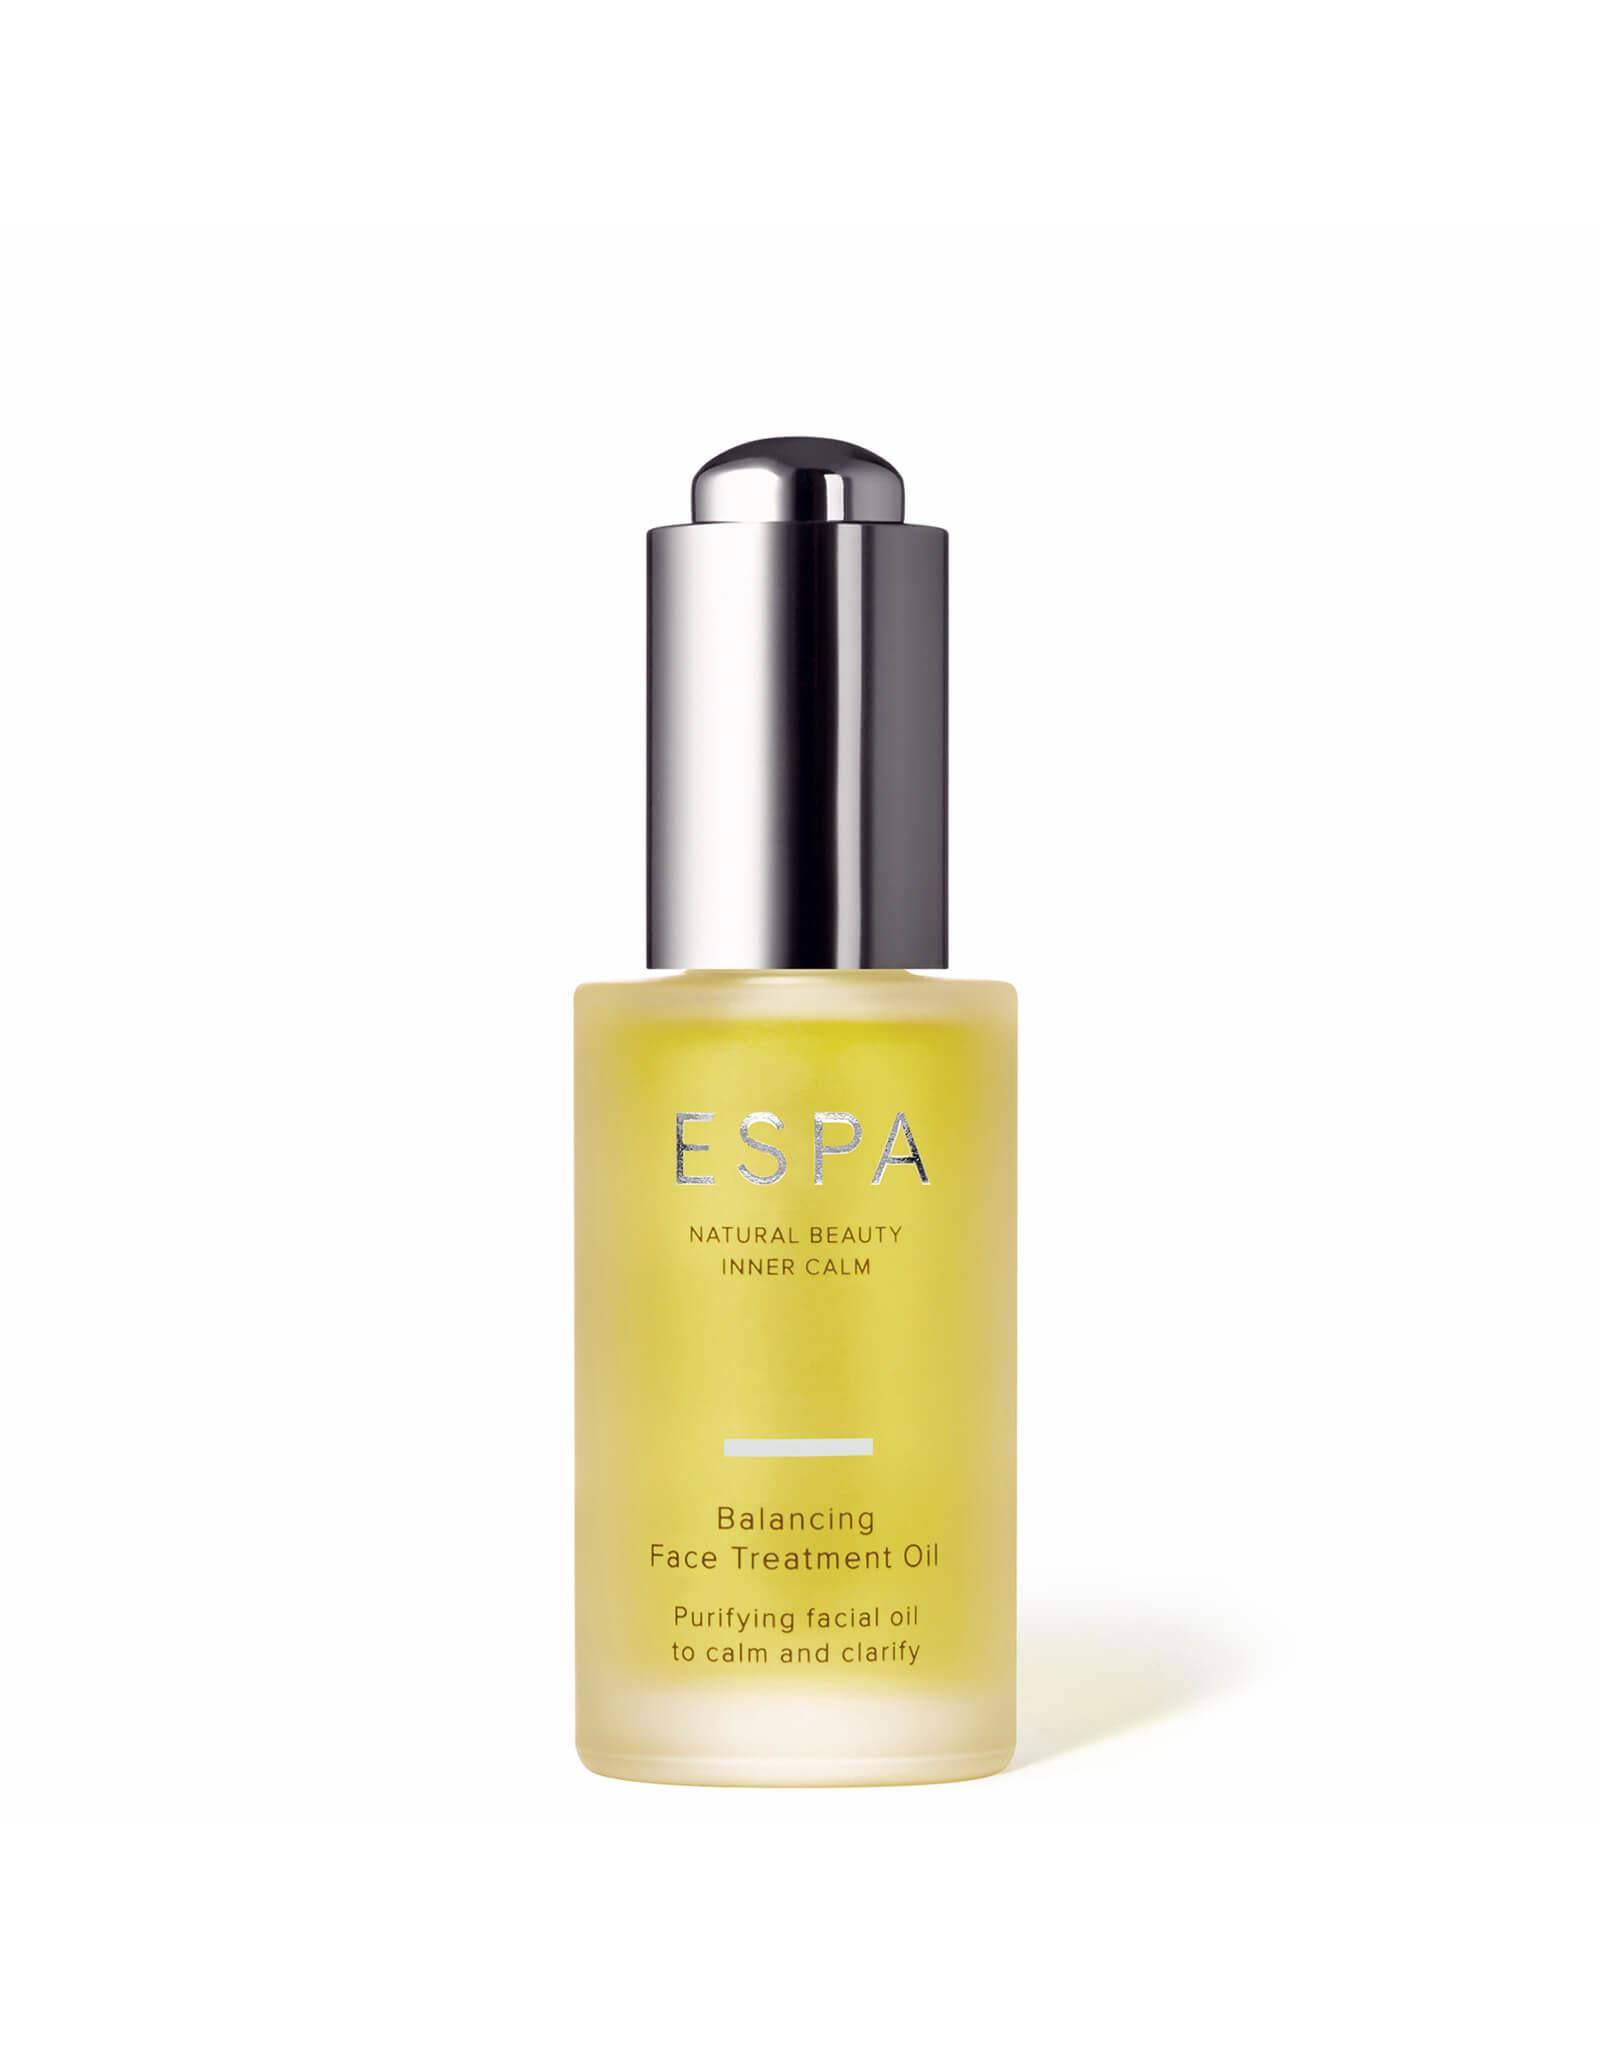 ESPA Balancing Face Treatment Oil, 30ml